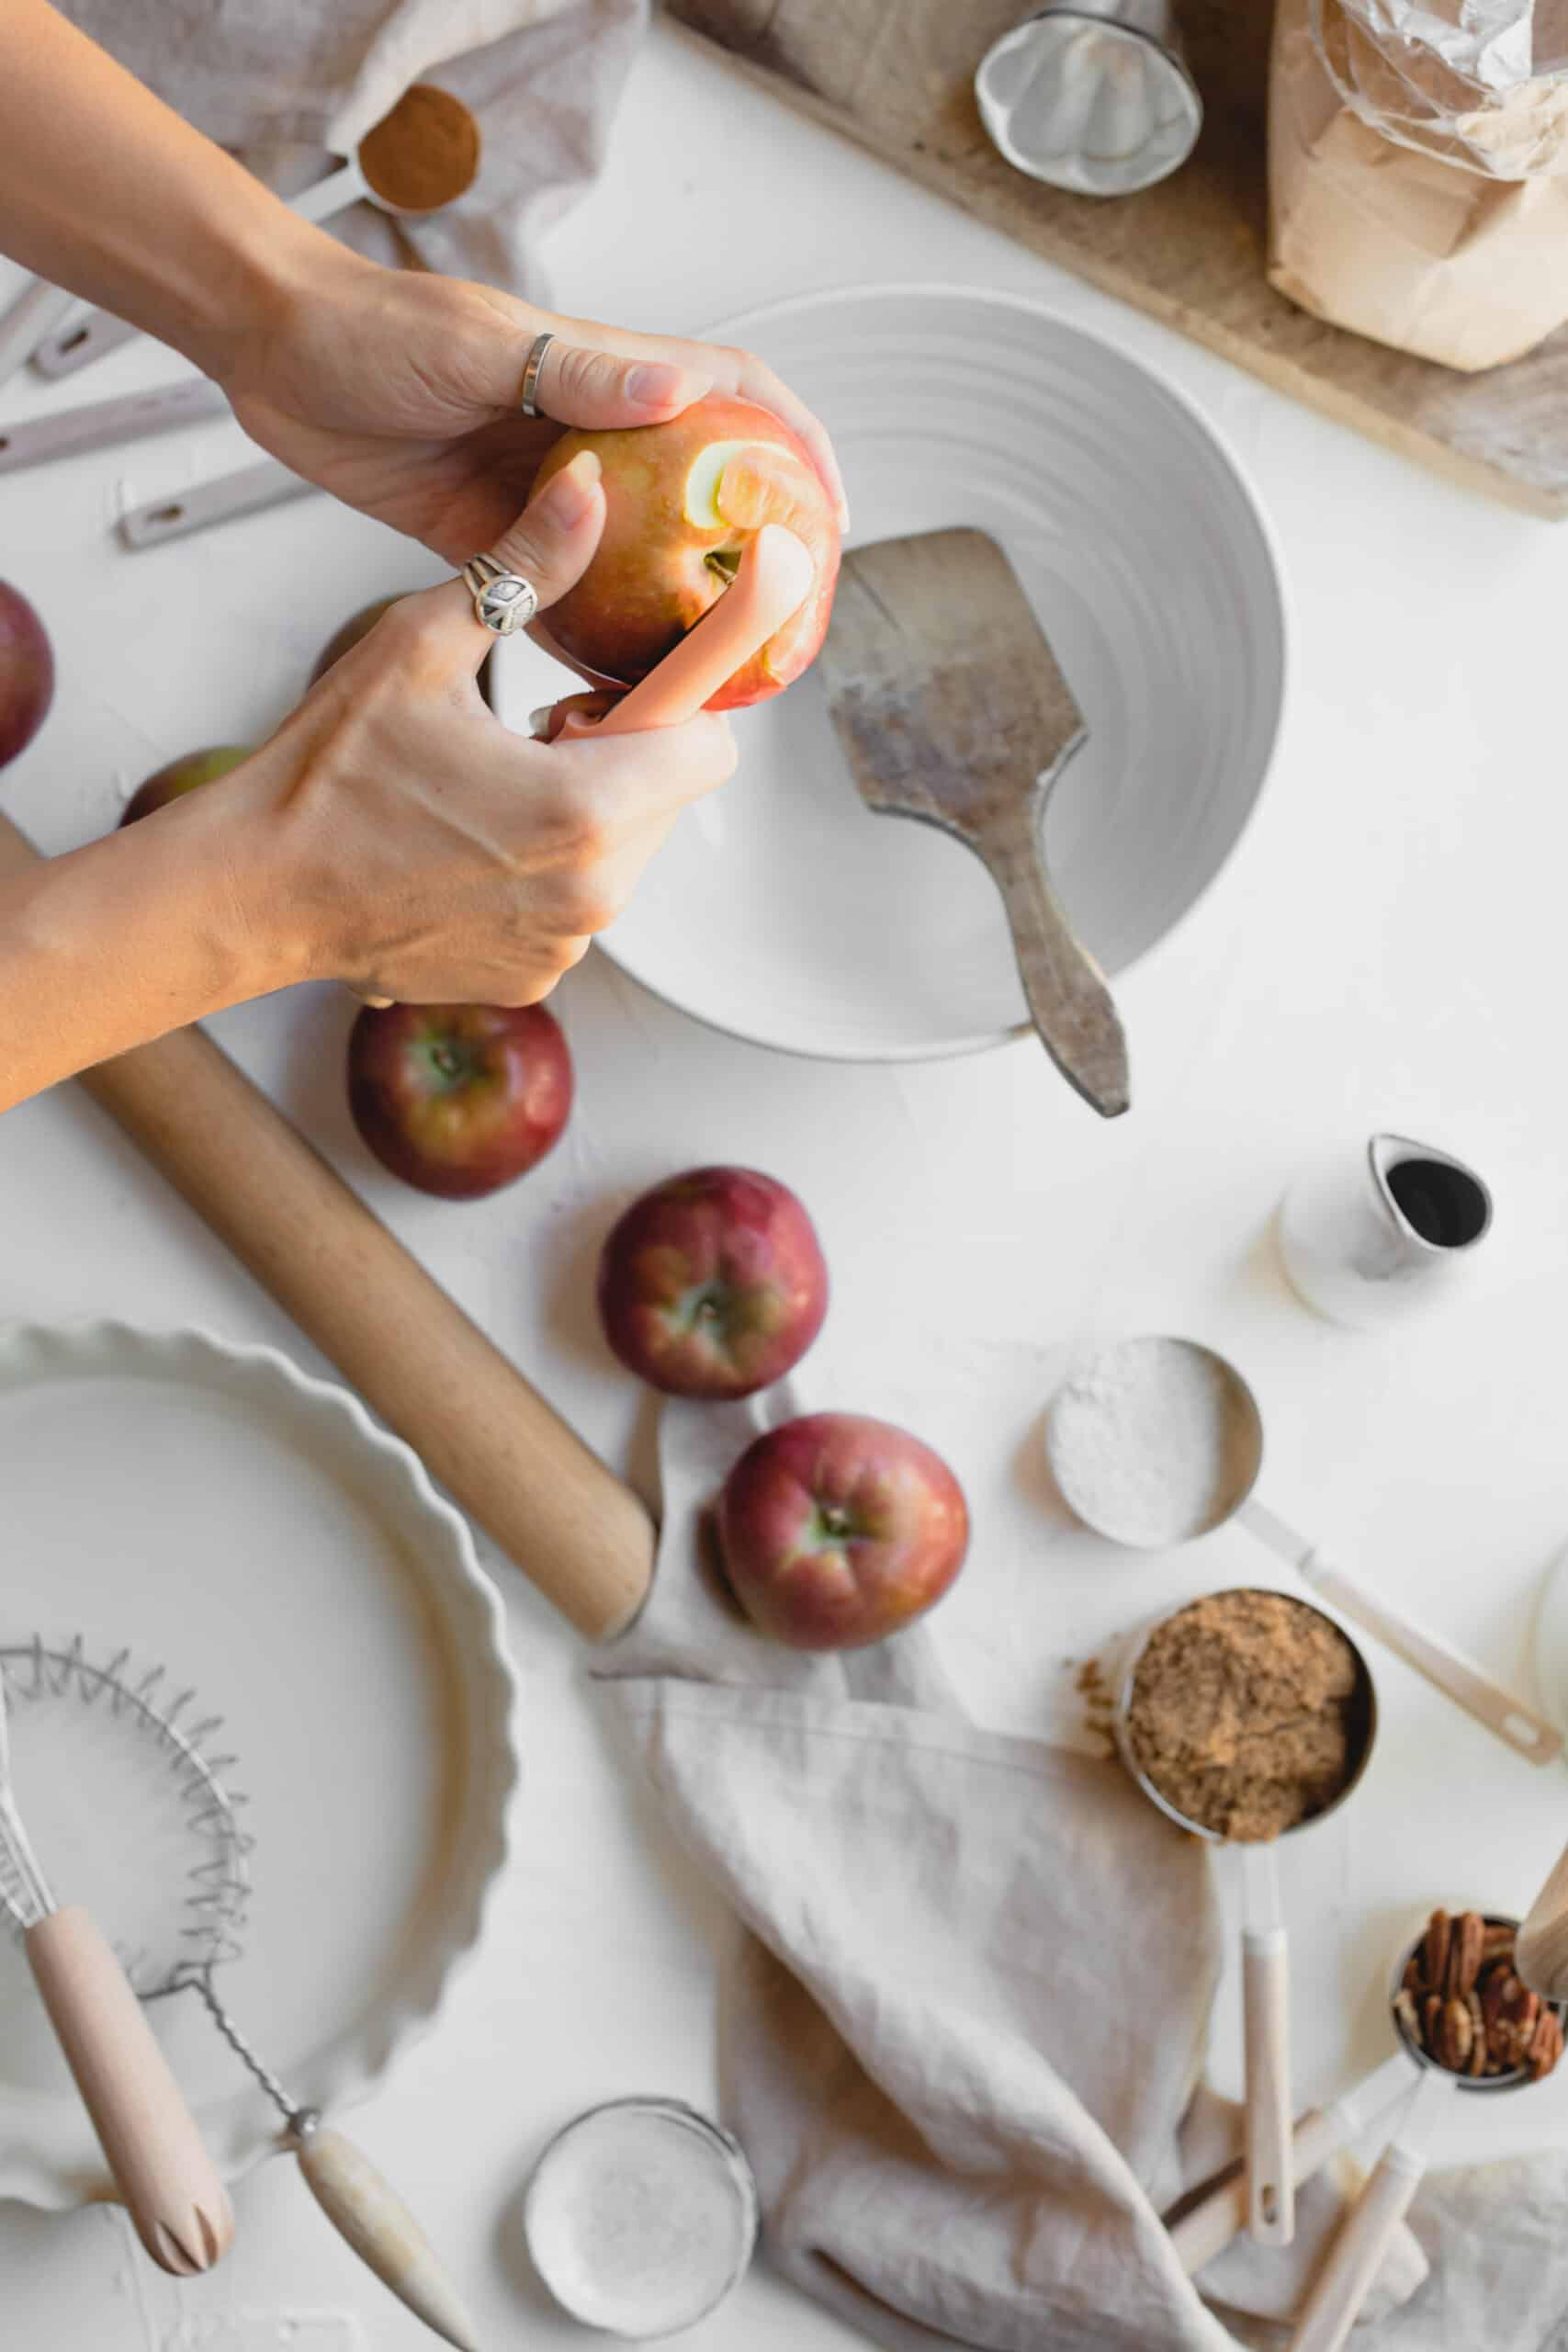 Hand peeling apple to make Vegan Apple Crumble.